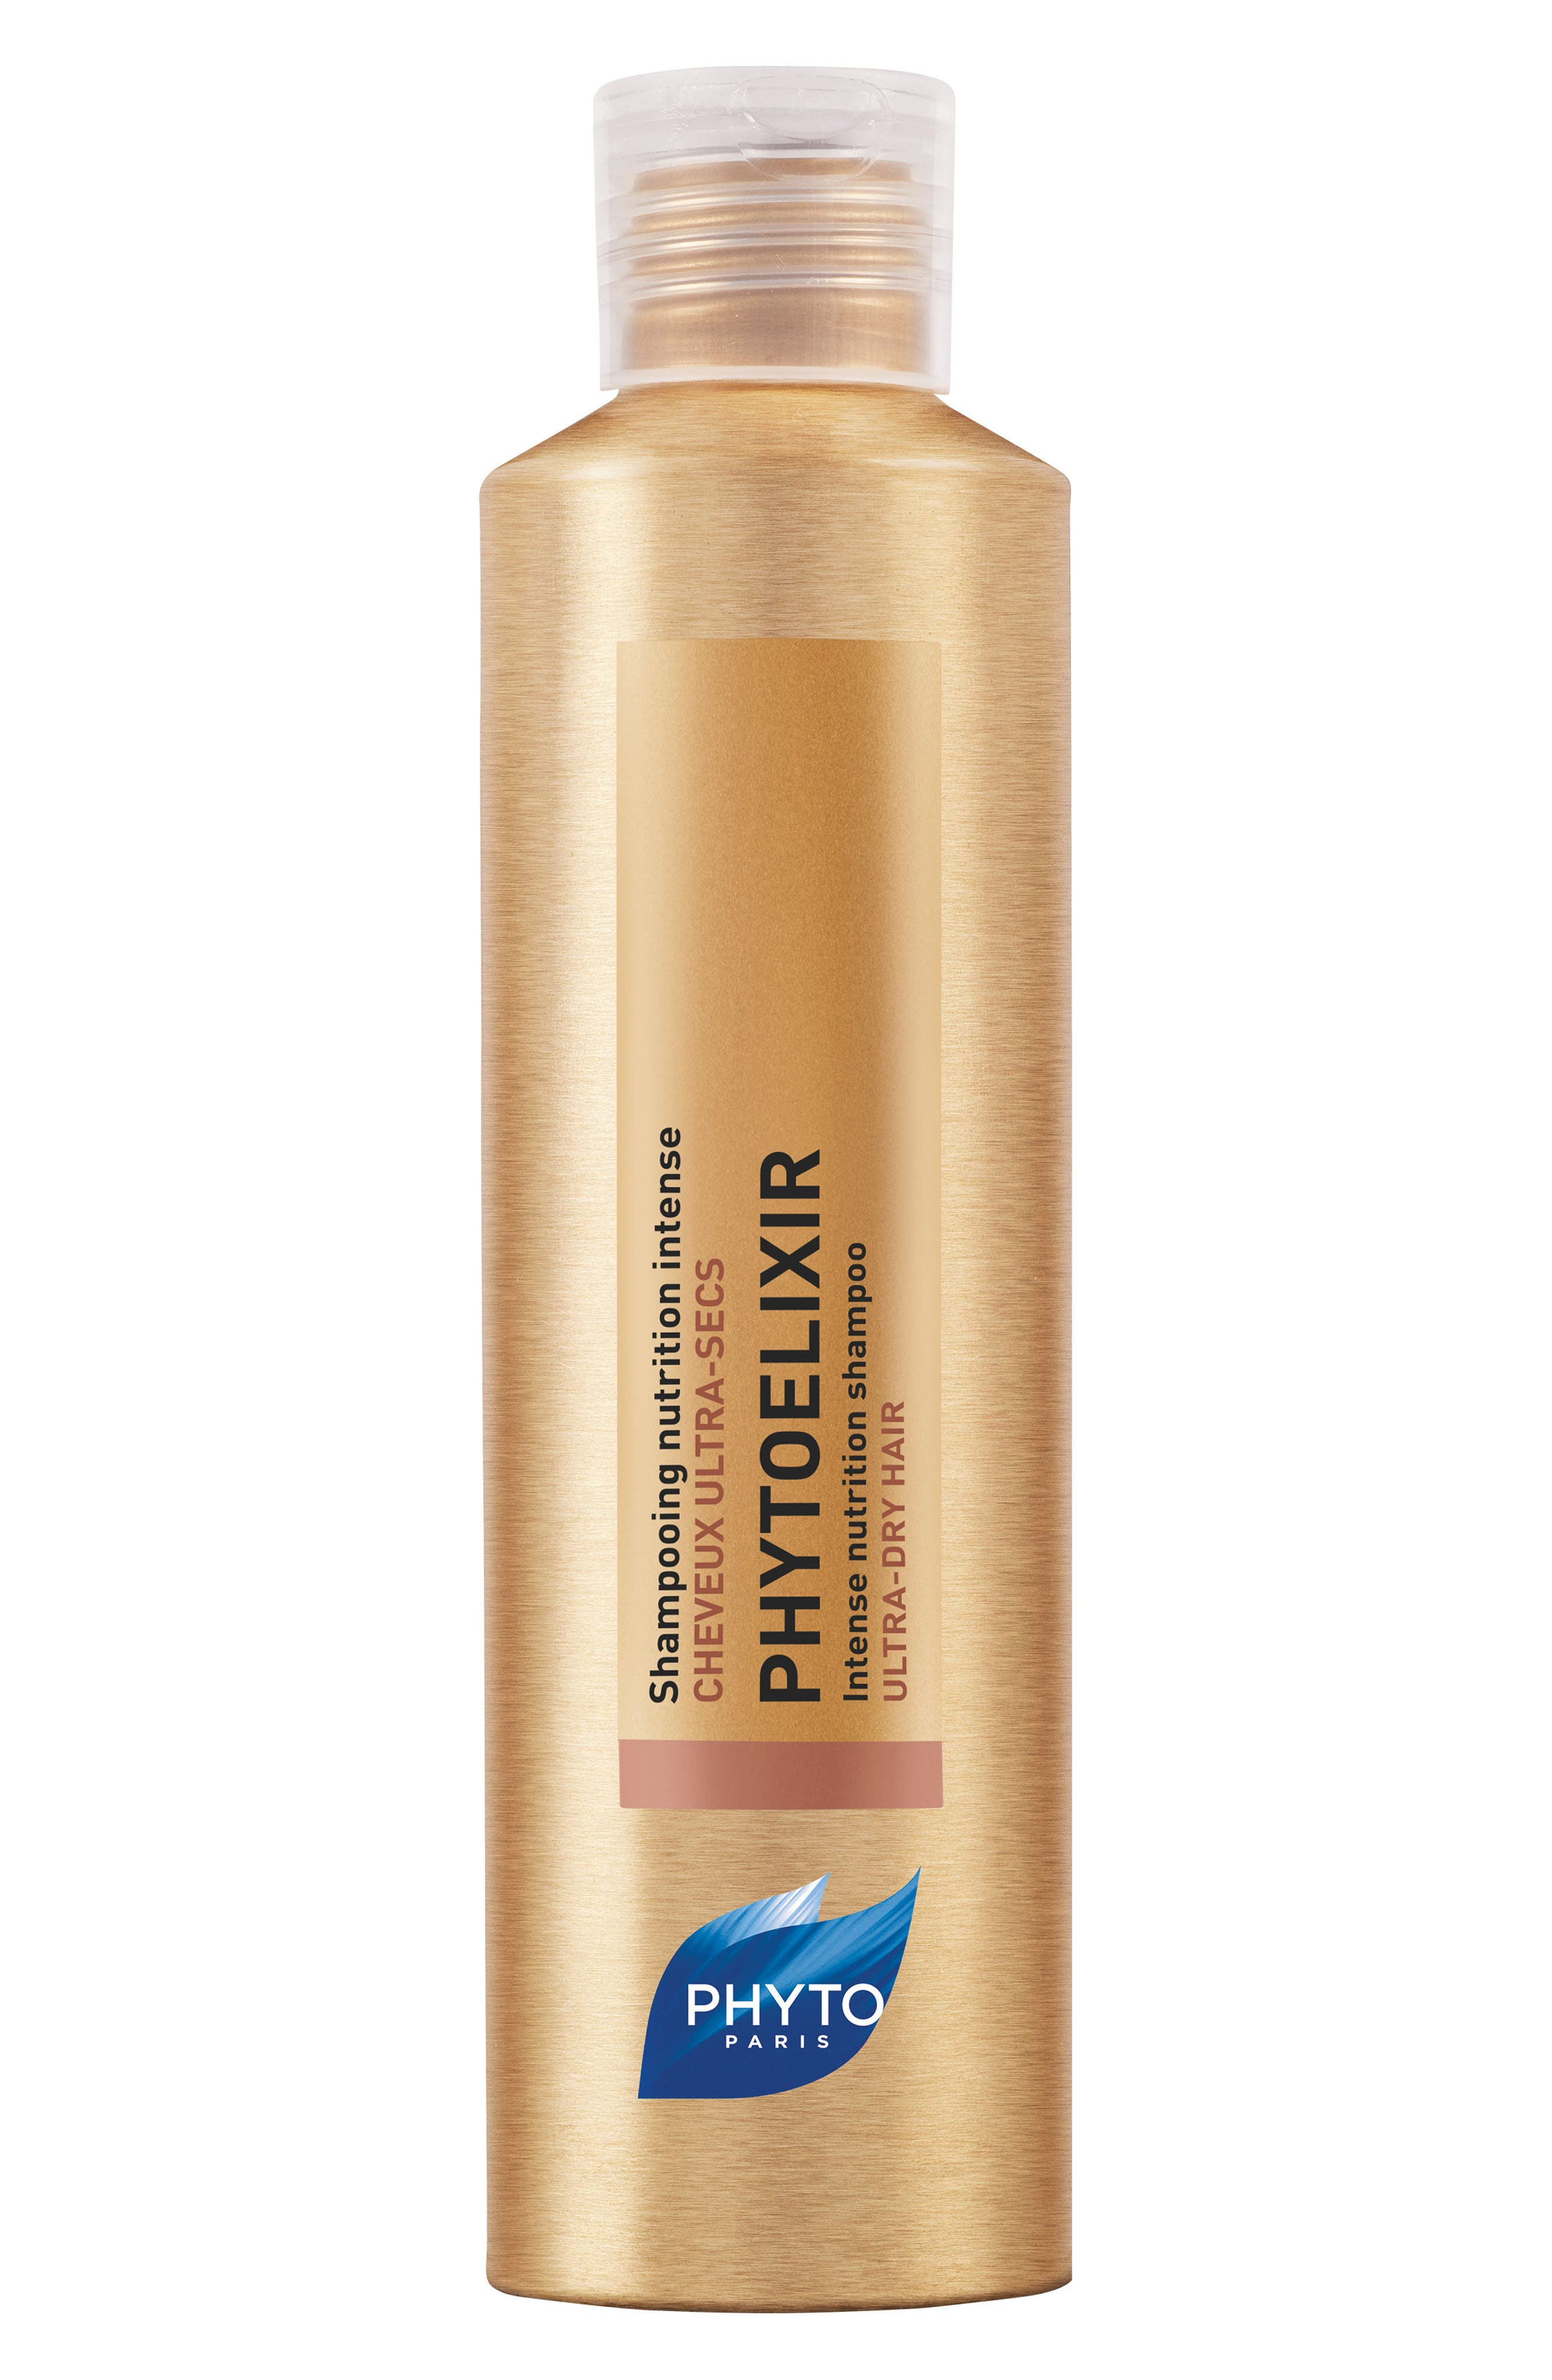 Phytoelixir Intense Nutrition Shampoo,                             Main thumbnail 1, color,                             No Color